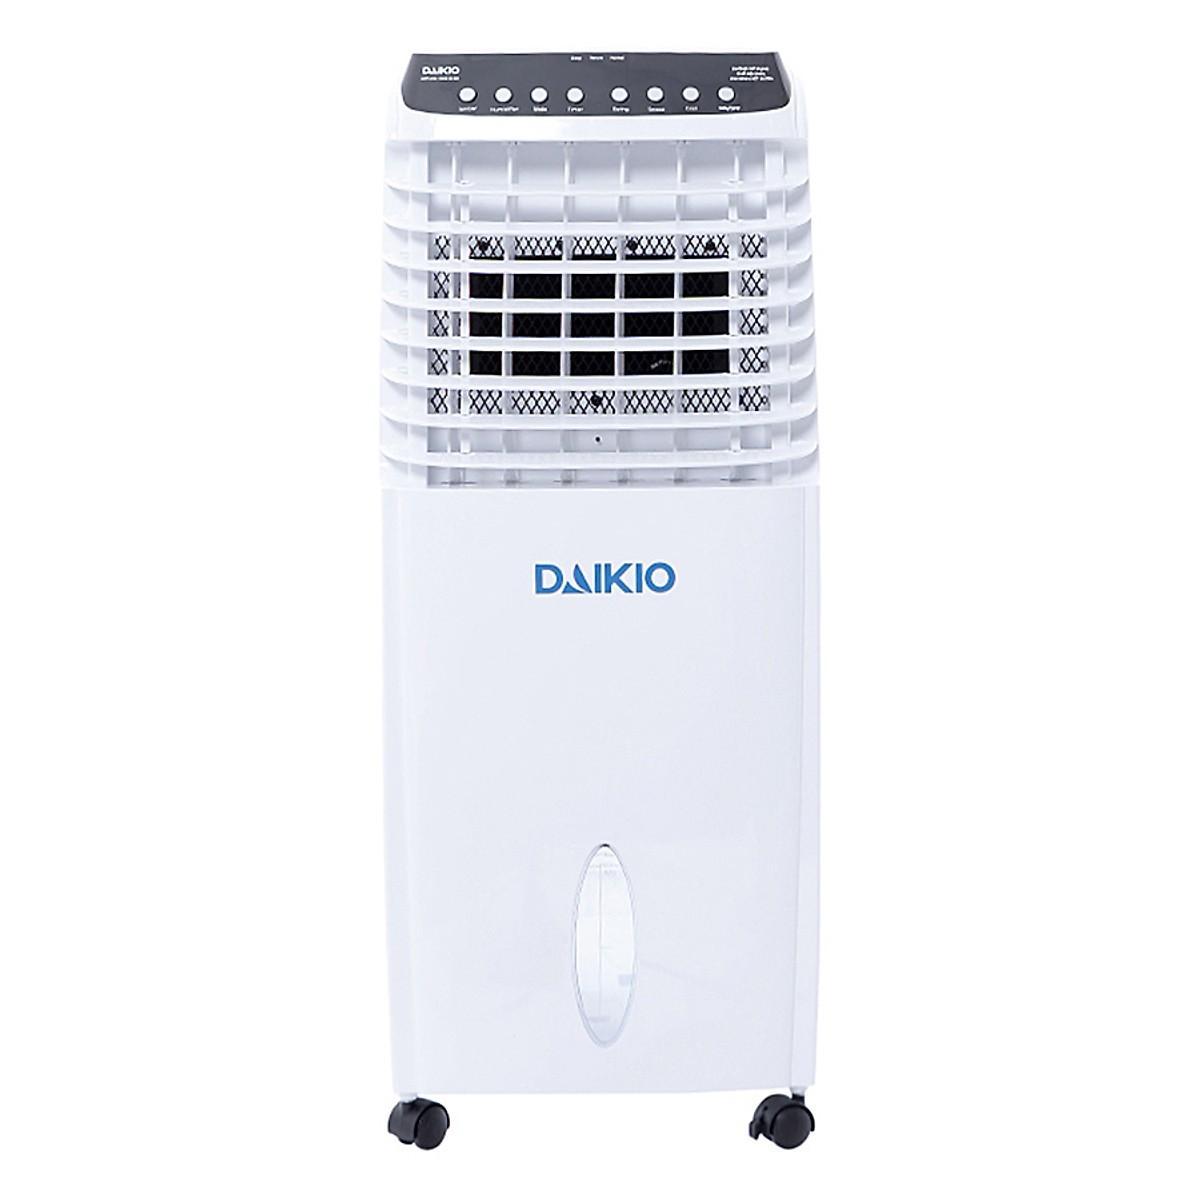 Bảng giá Máy làm mát không khí Daikio DK-800A (DKA-00800A)